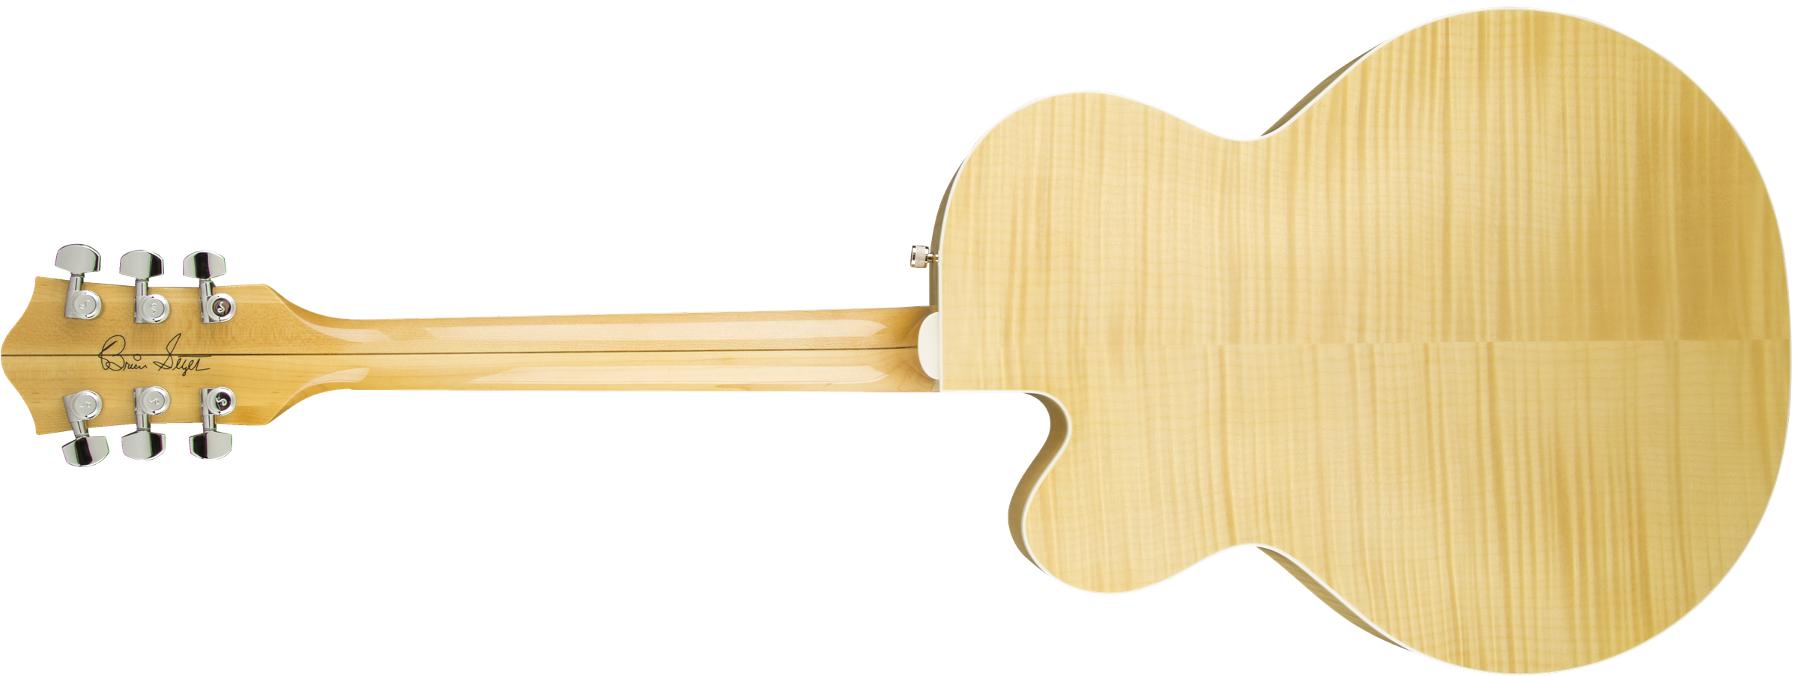 Brian Setzer Blonde Hot Rod Hollow Body Electric Guitar, Blonde